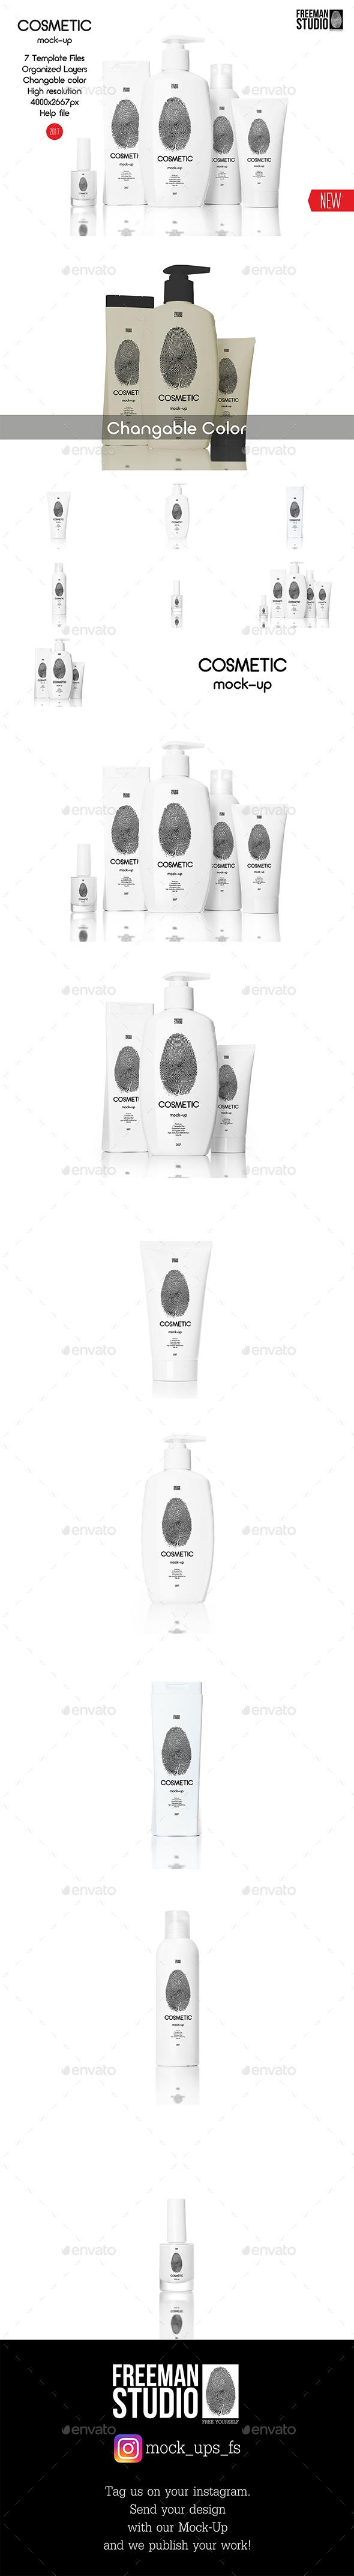 Cosmetic Mock-Up 2017 - Product Mock-Ups Graphics